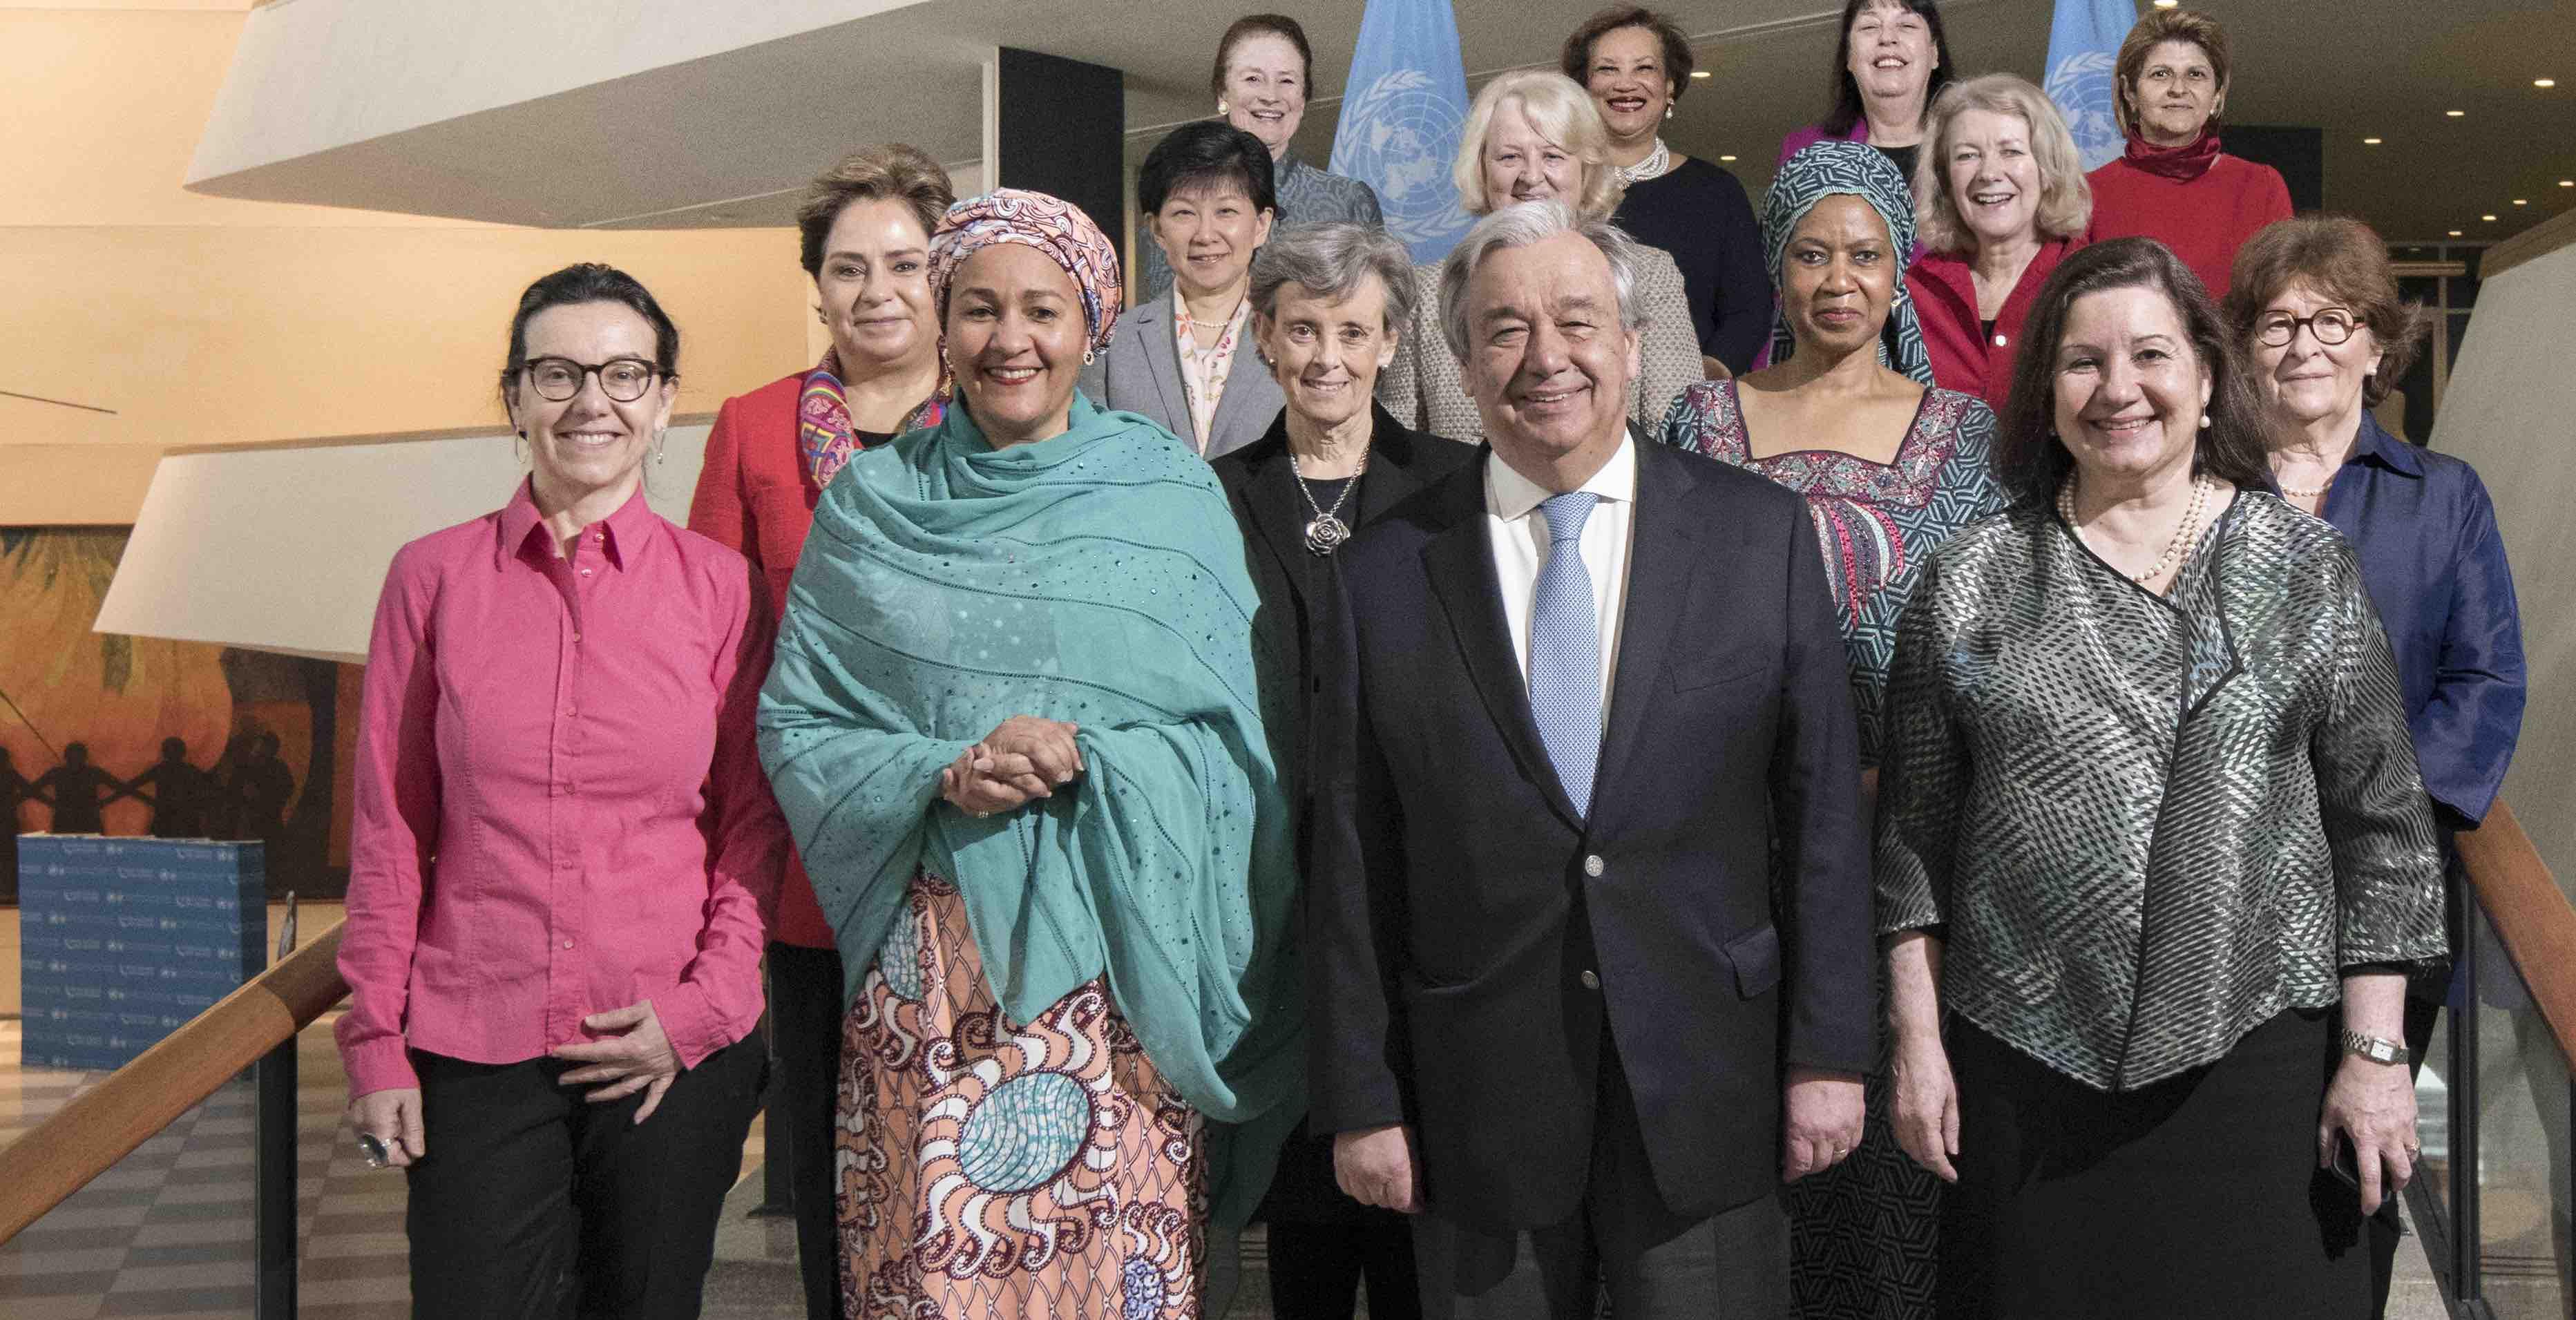 Women from the UN Secretariat leadership team with Secretary-General Antonio Guterres last month (Photo: UN Photo)